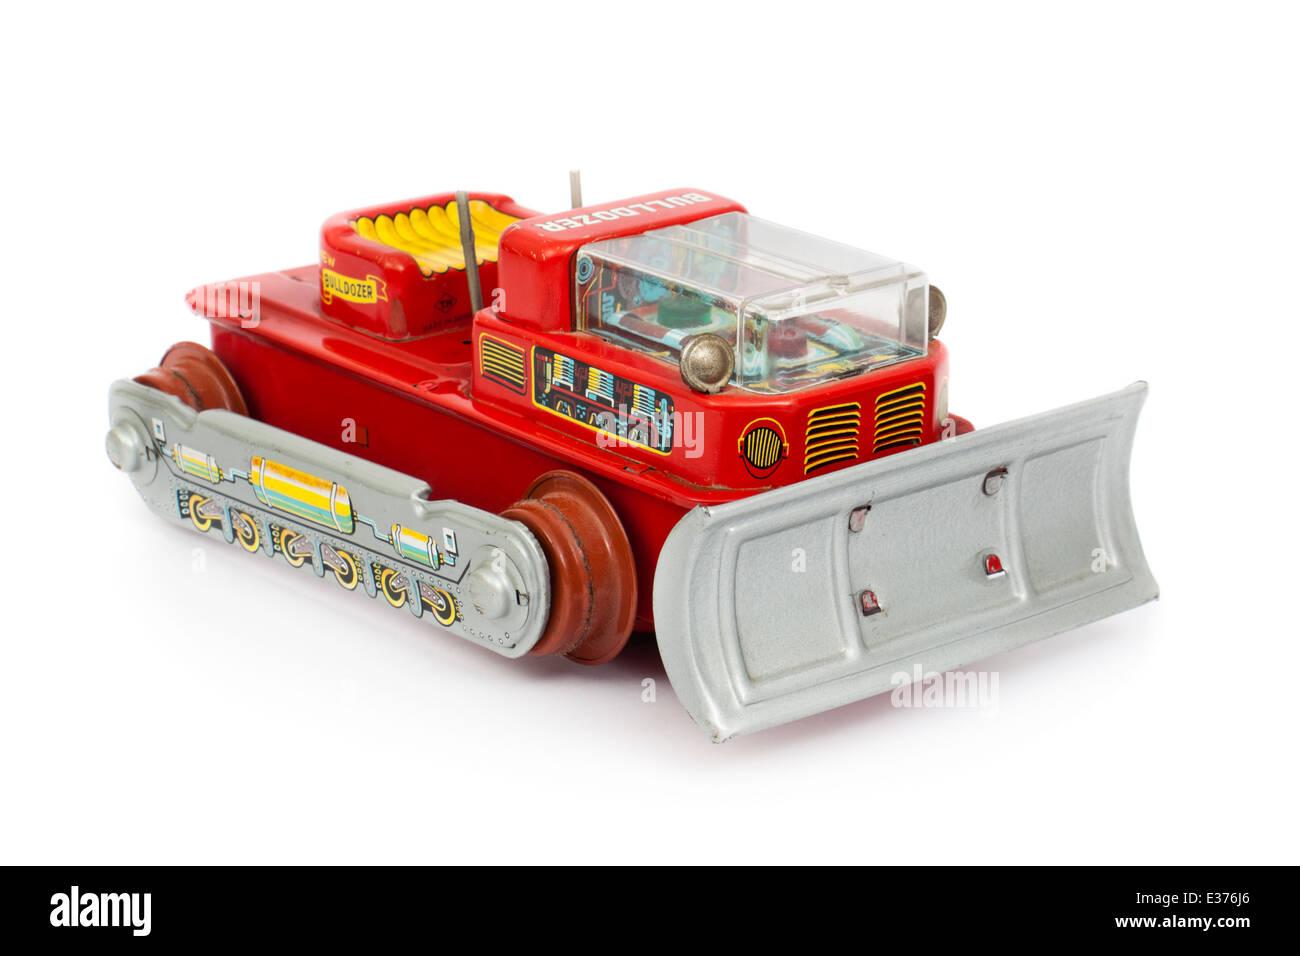 Vintage 1960's Japanese tinplate toy bulldozer - Stock Image